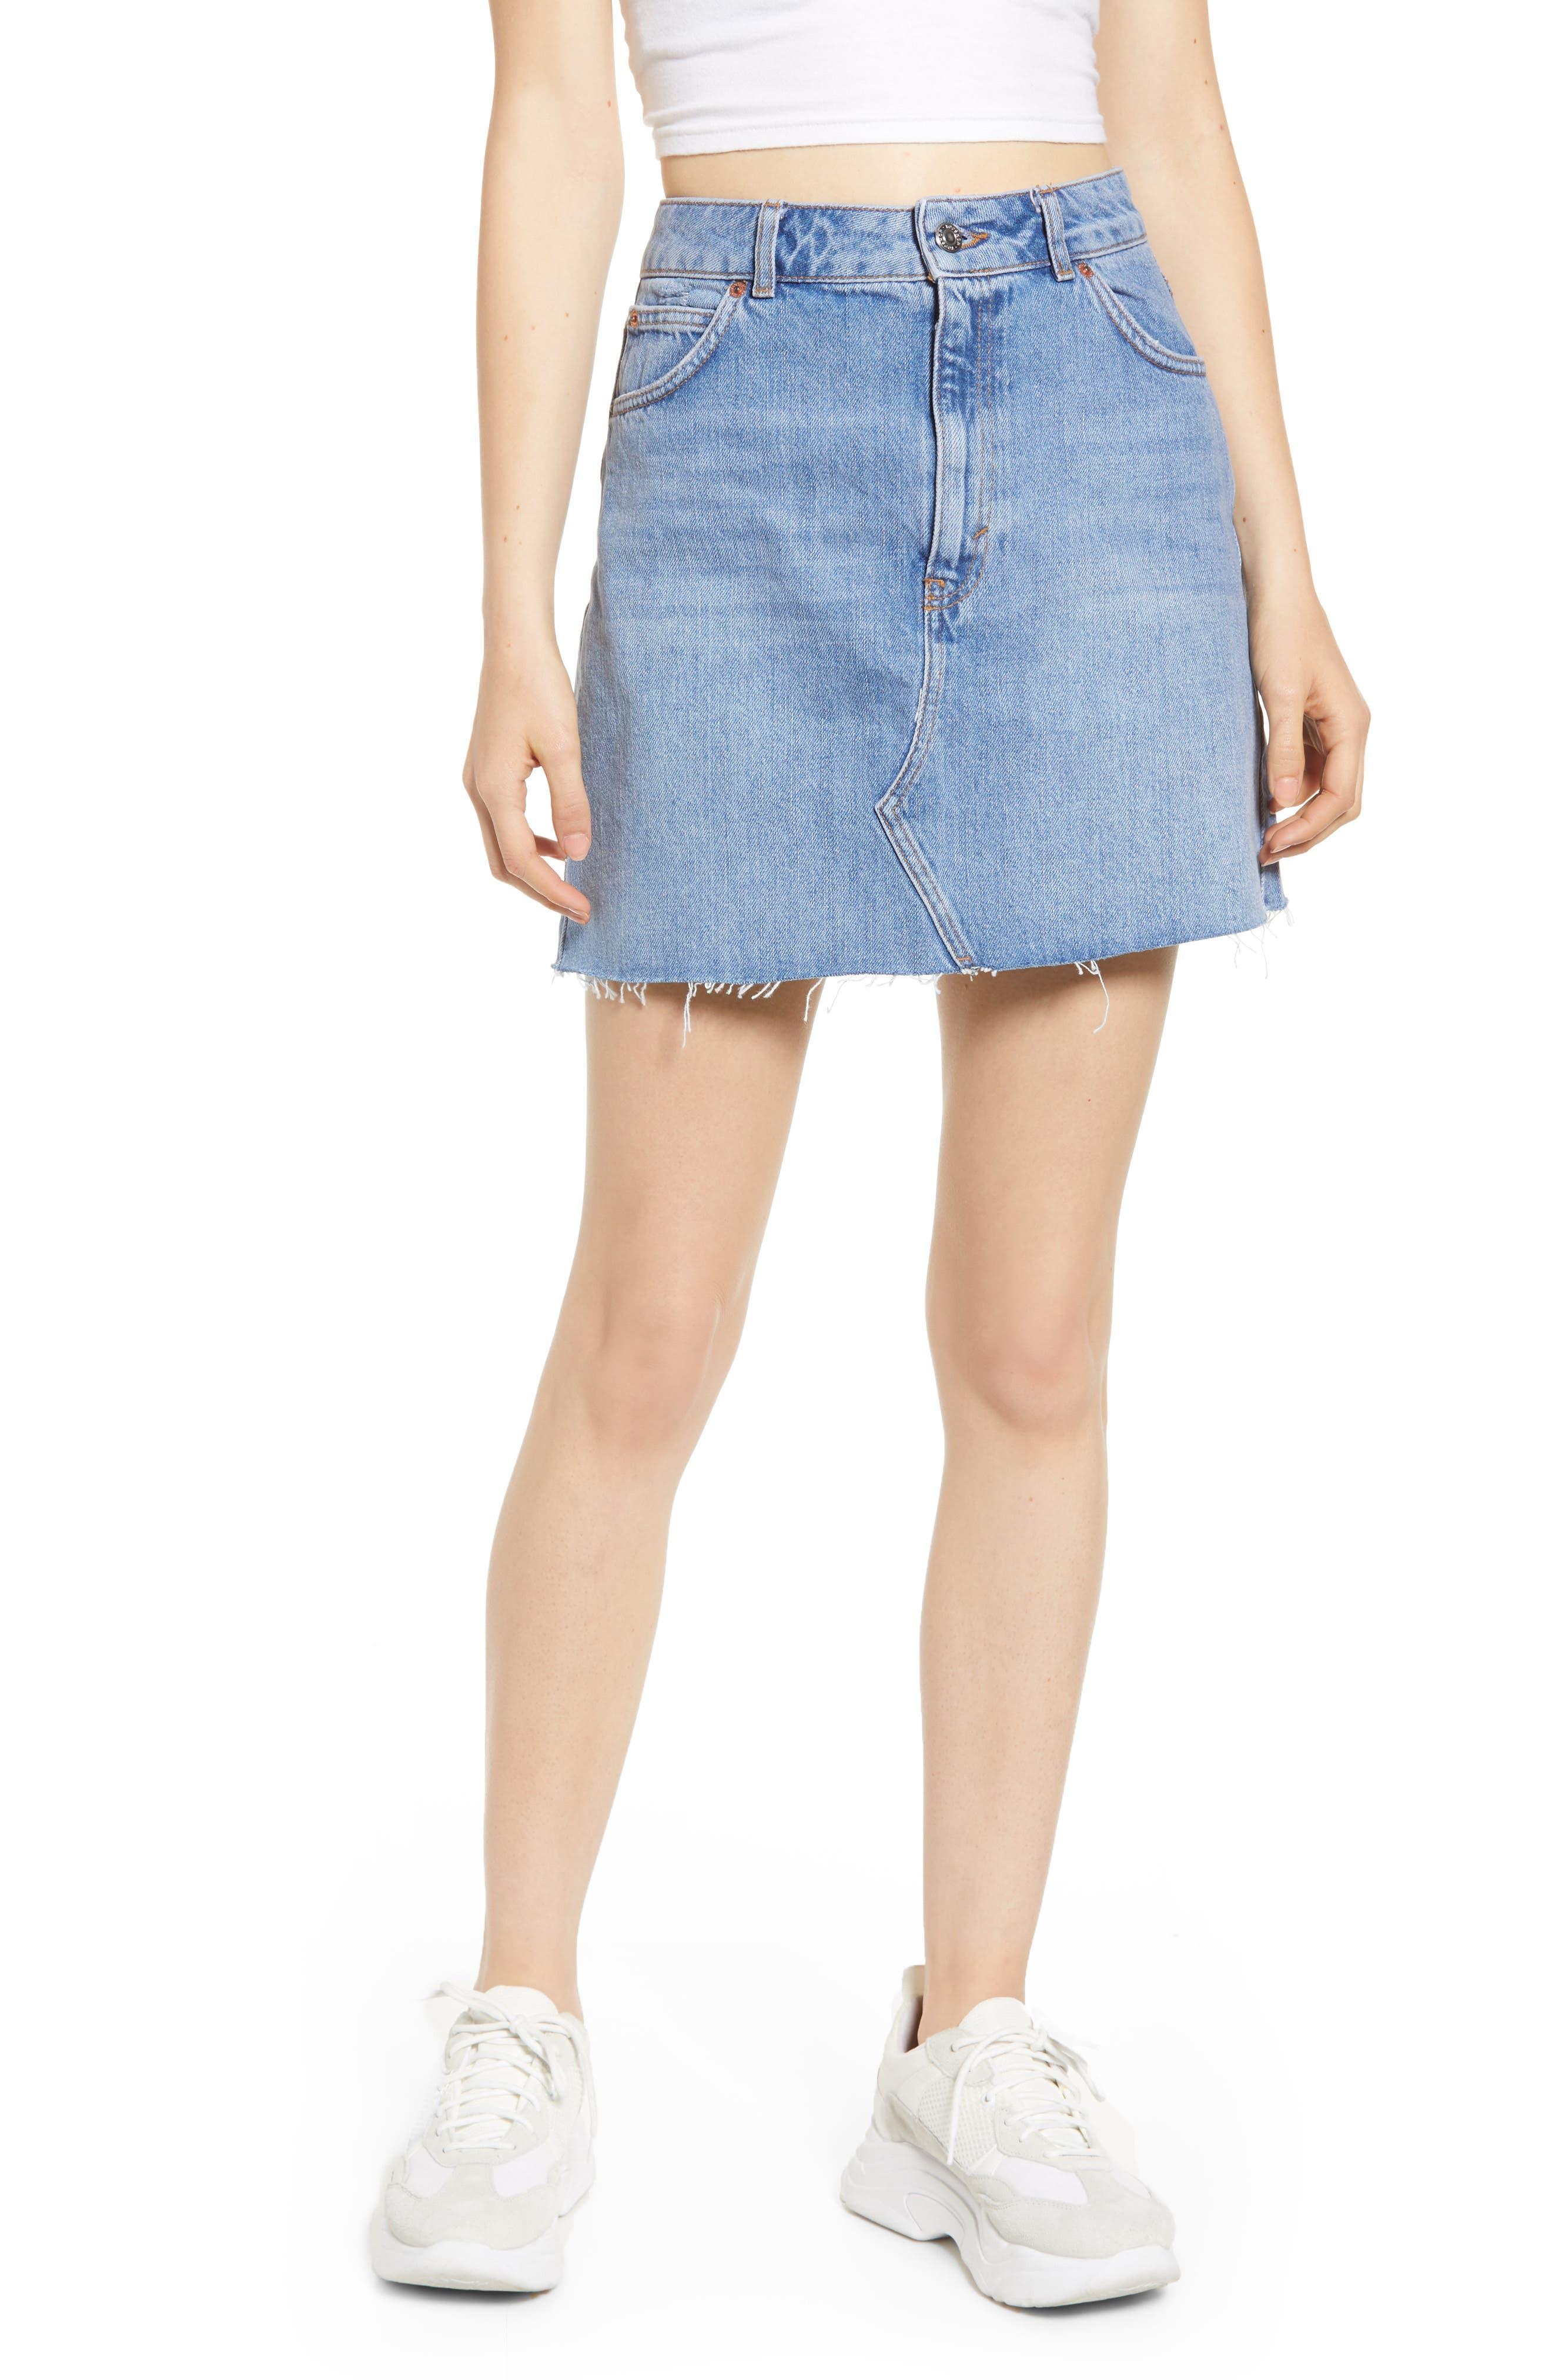 Topshop Moto Frayed Hem Miniskirt, US (fits like 16-18) - Blue